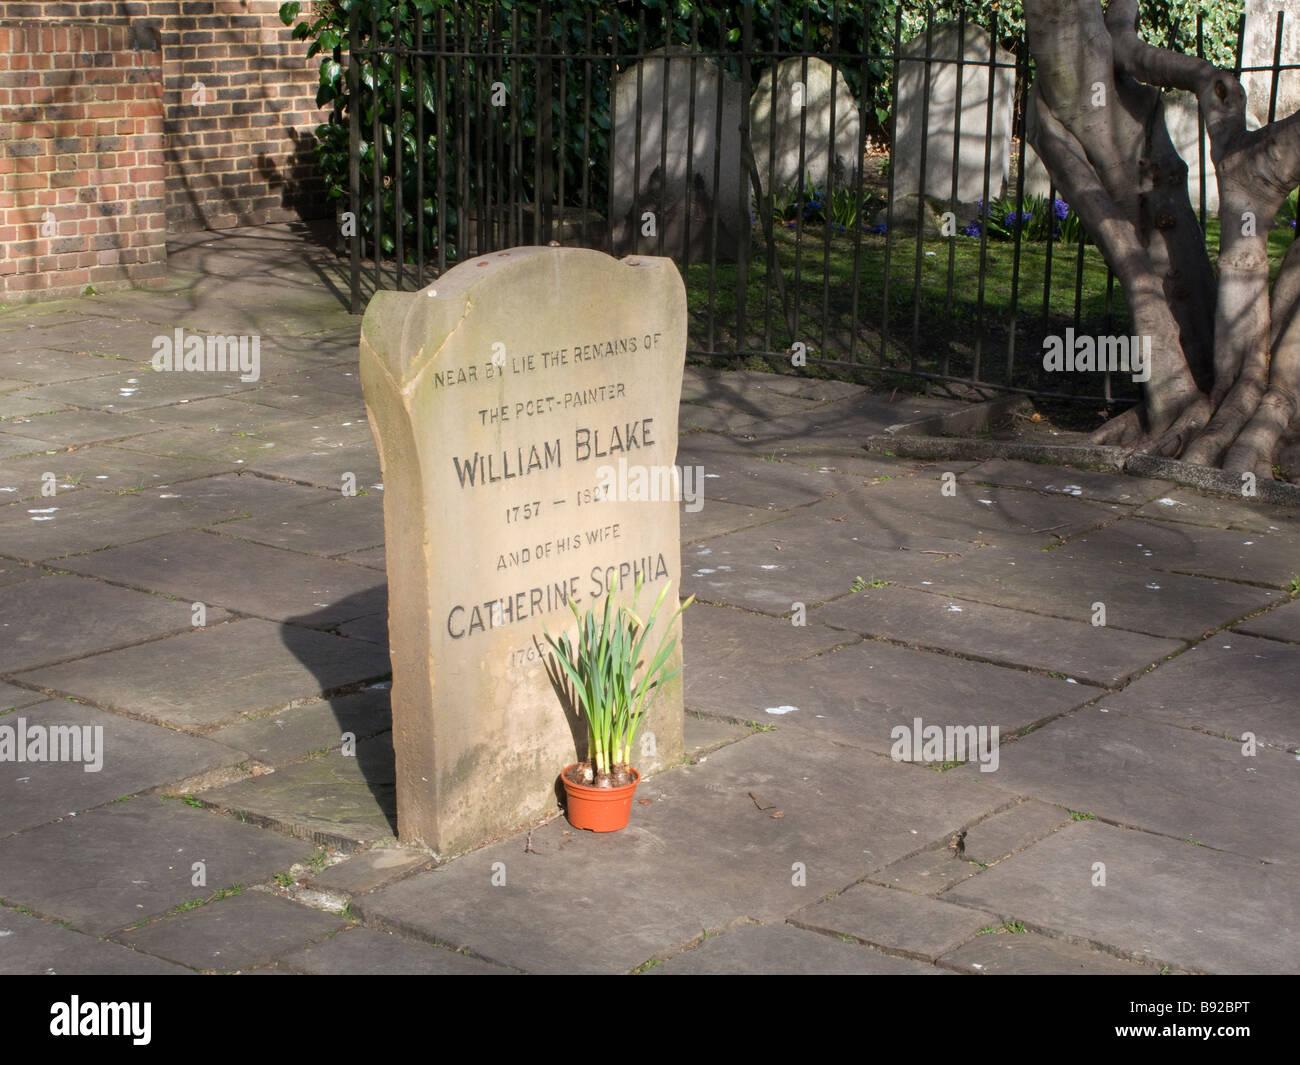 William Blake's gravestone, Bunhill Fields, London - Stock Image